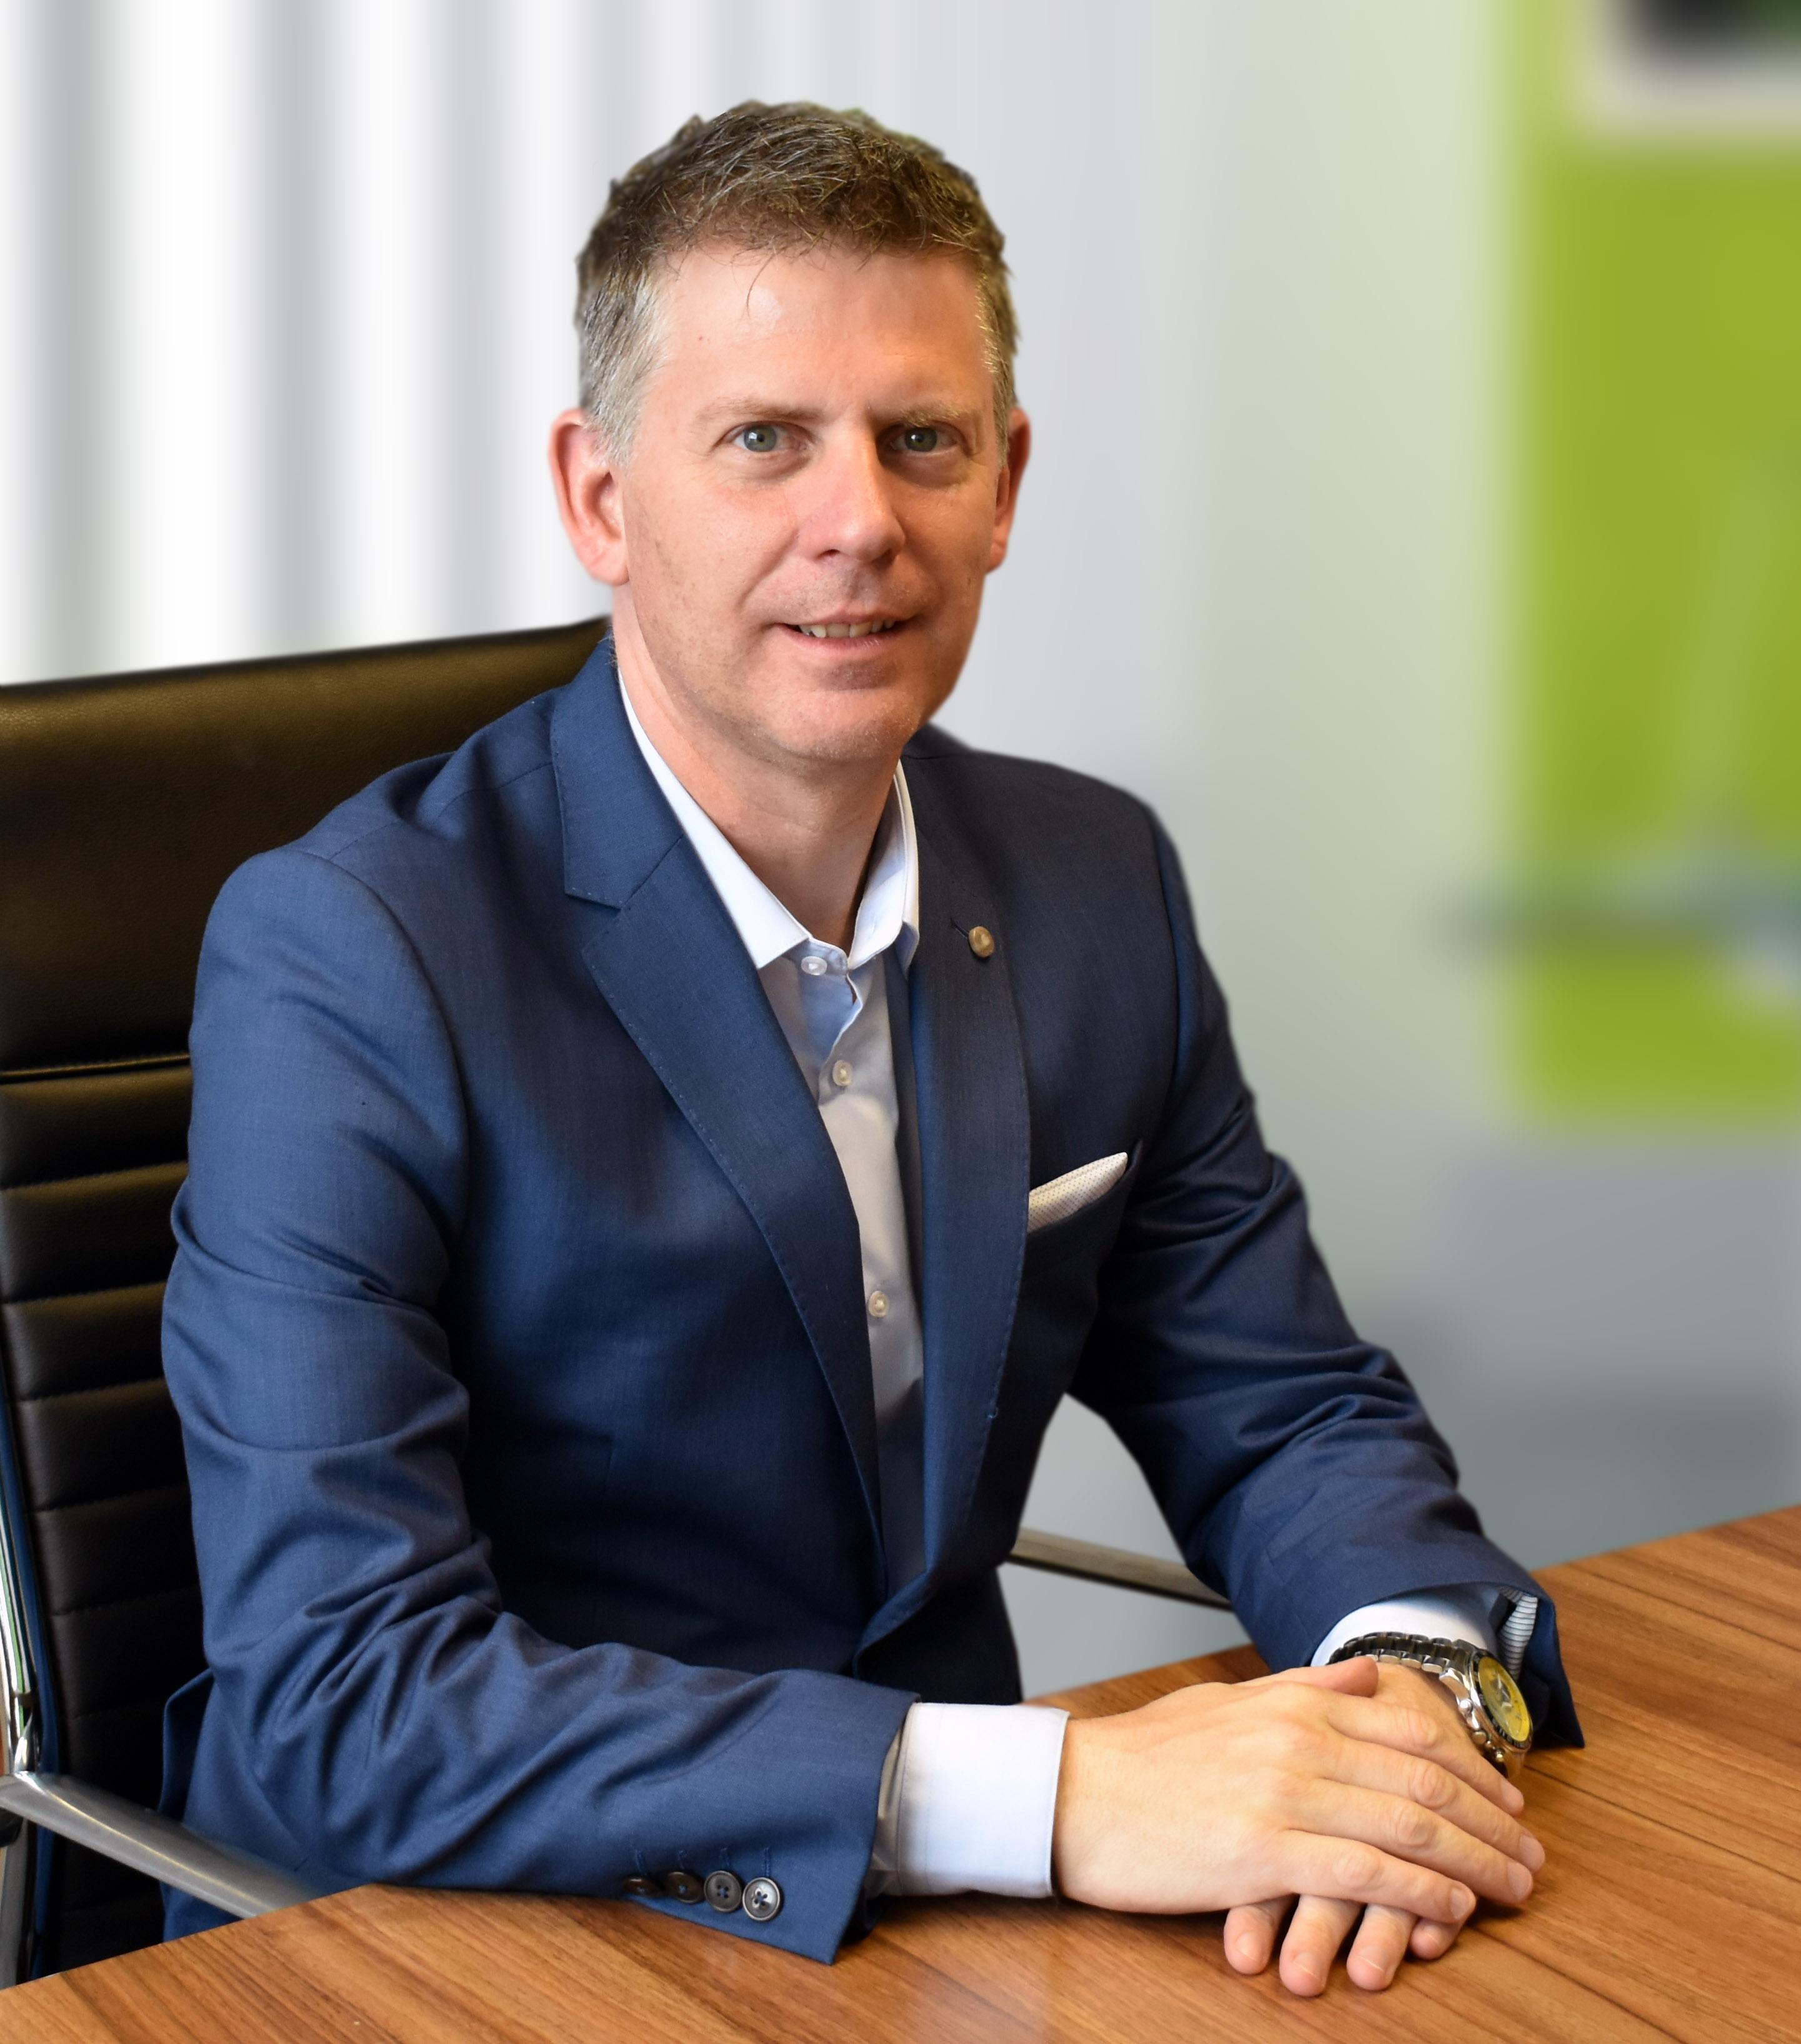 Dave Patten - Abbey Logistics Group